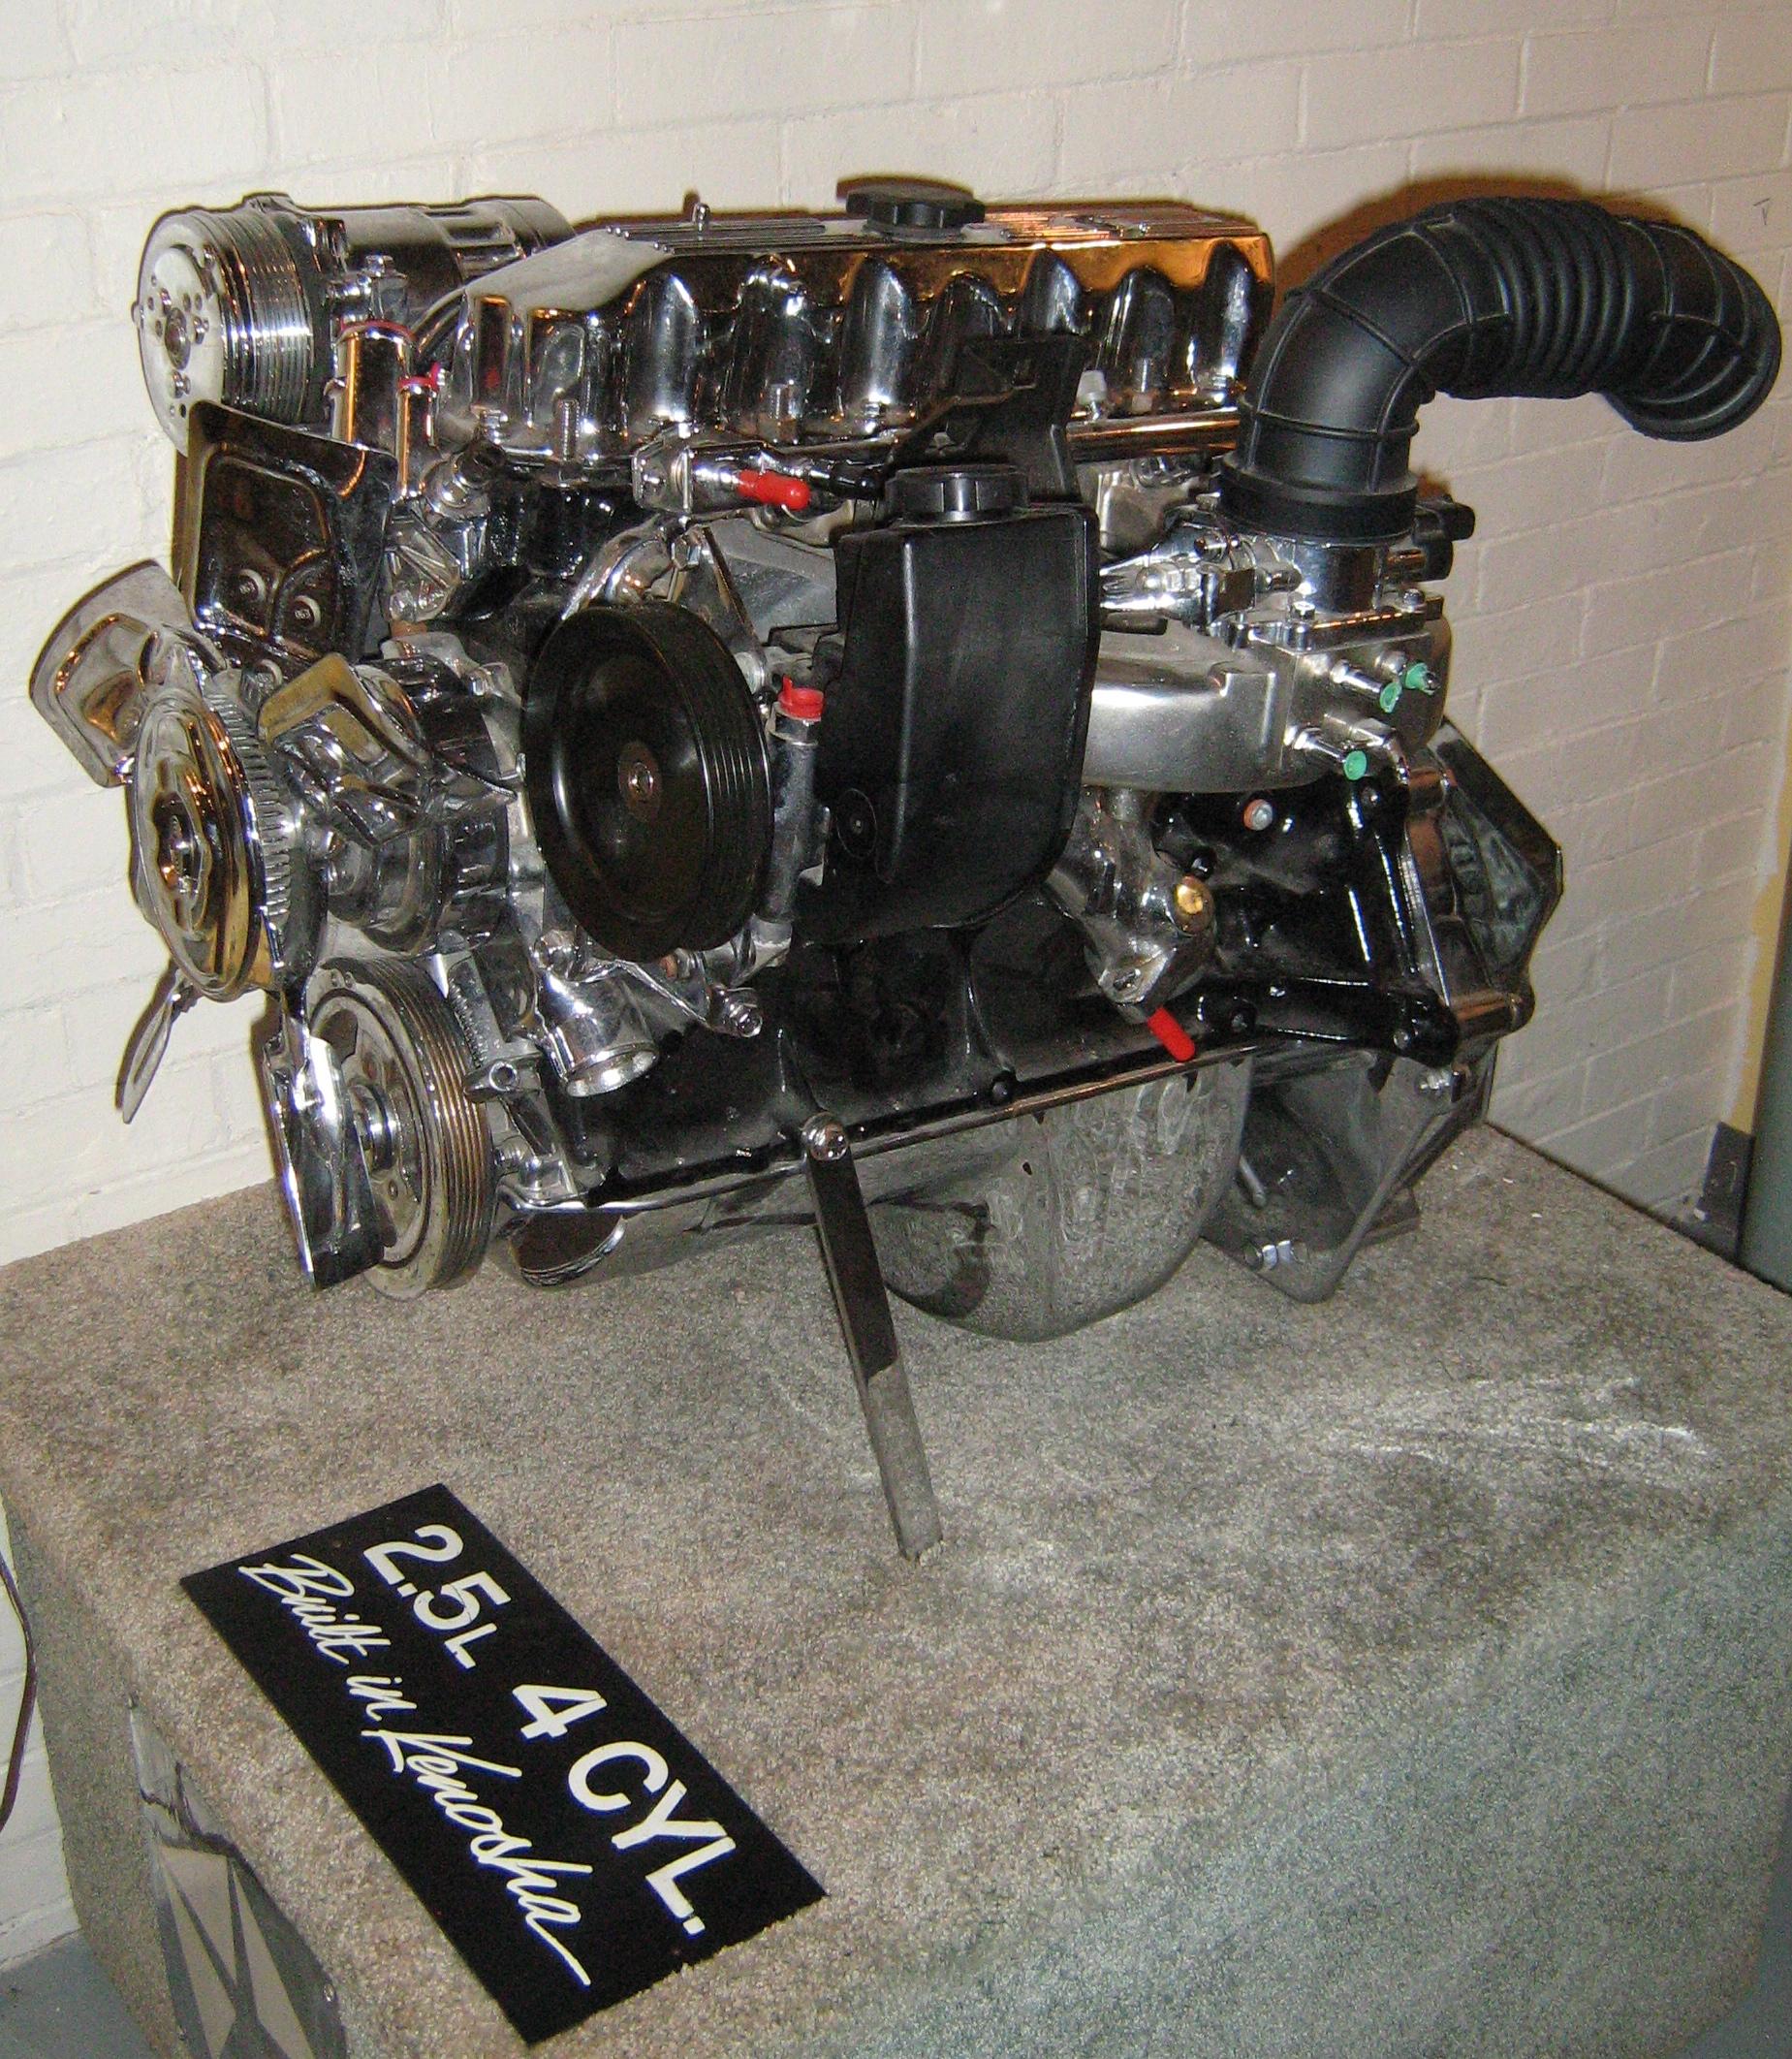 [SCHEMATICS_4JK]  CB_9159] Liter Jeep Engine Diagrams Jeep Wrangler 4 0 Engine Diagram Jeep  Schematic Wiring | 1990 Jeep Engine Diagrams |  | Weveq Epete Isra Mohammedshrine Librar Wiring 101